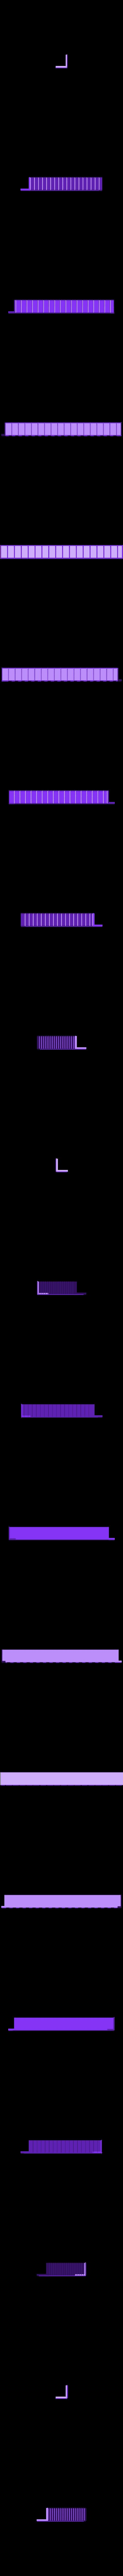 Chainage_angle.STL Download STL file Station 3 Doors PLM Coursan • 3D print model, dede34500